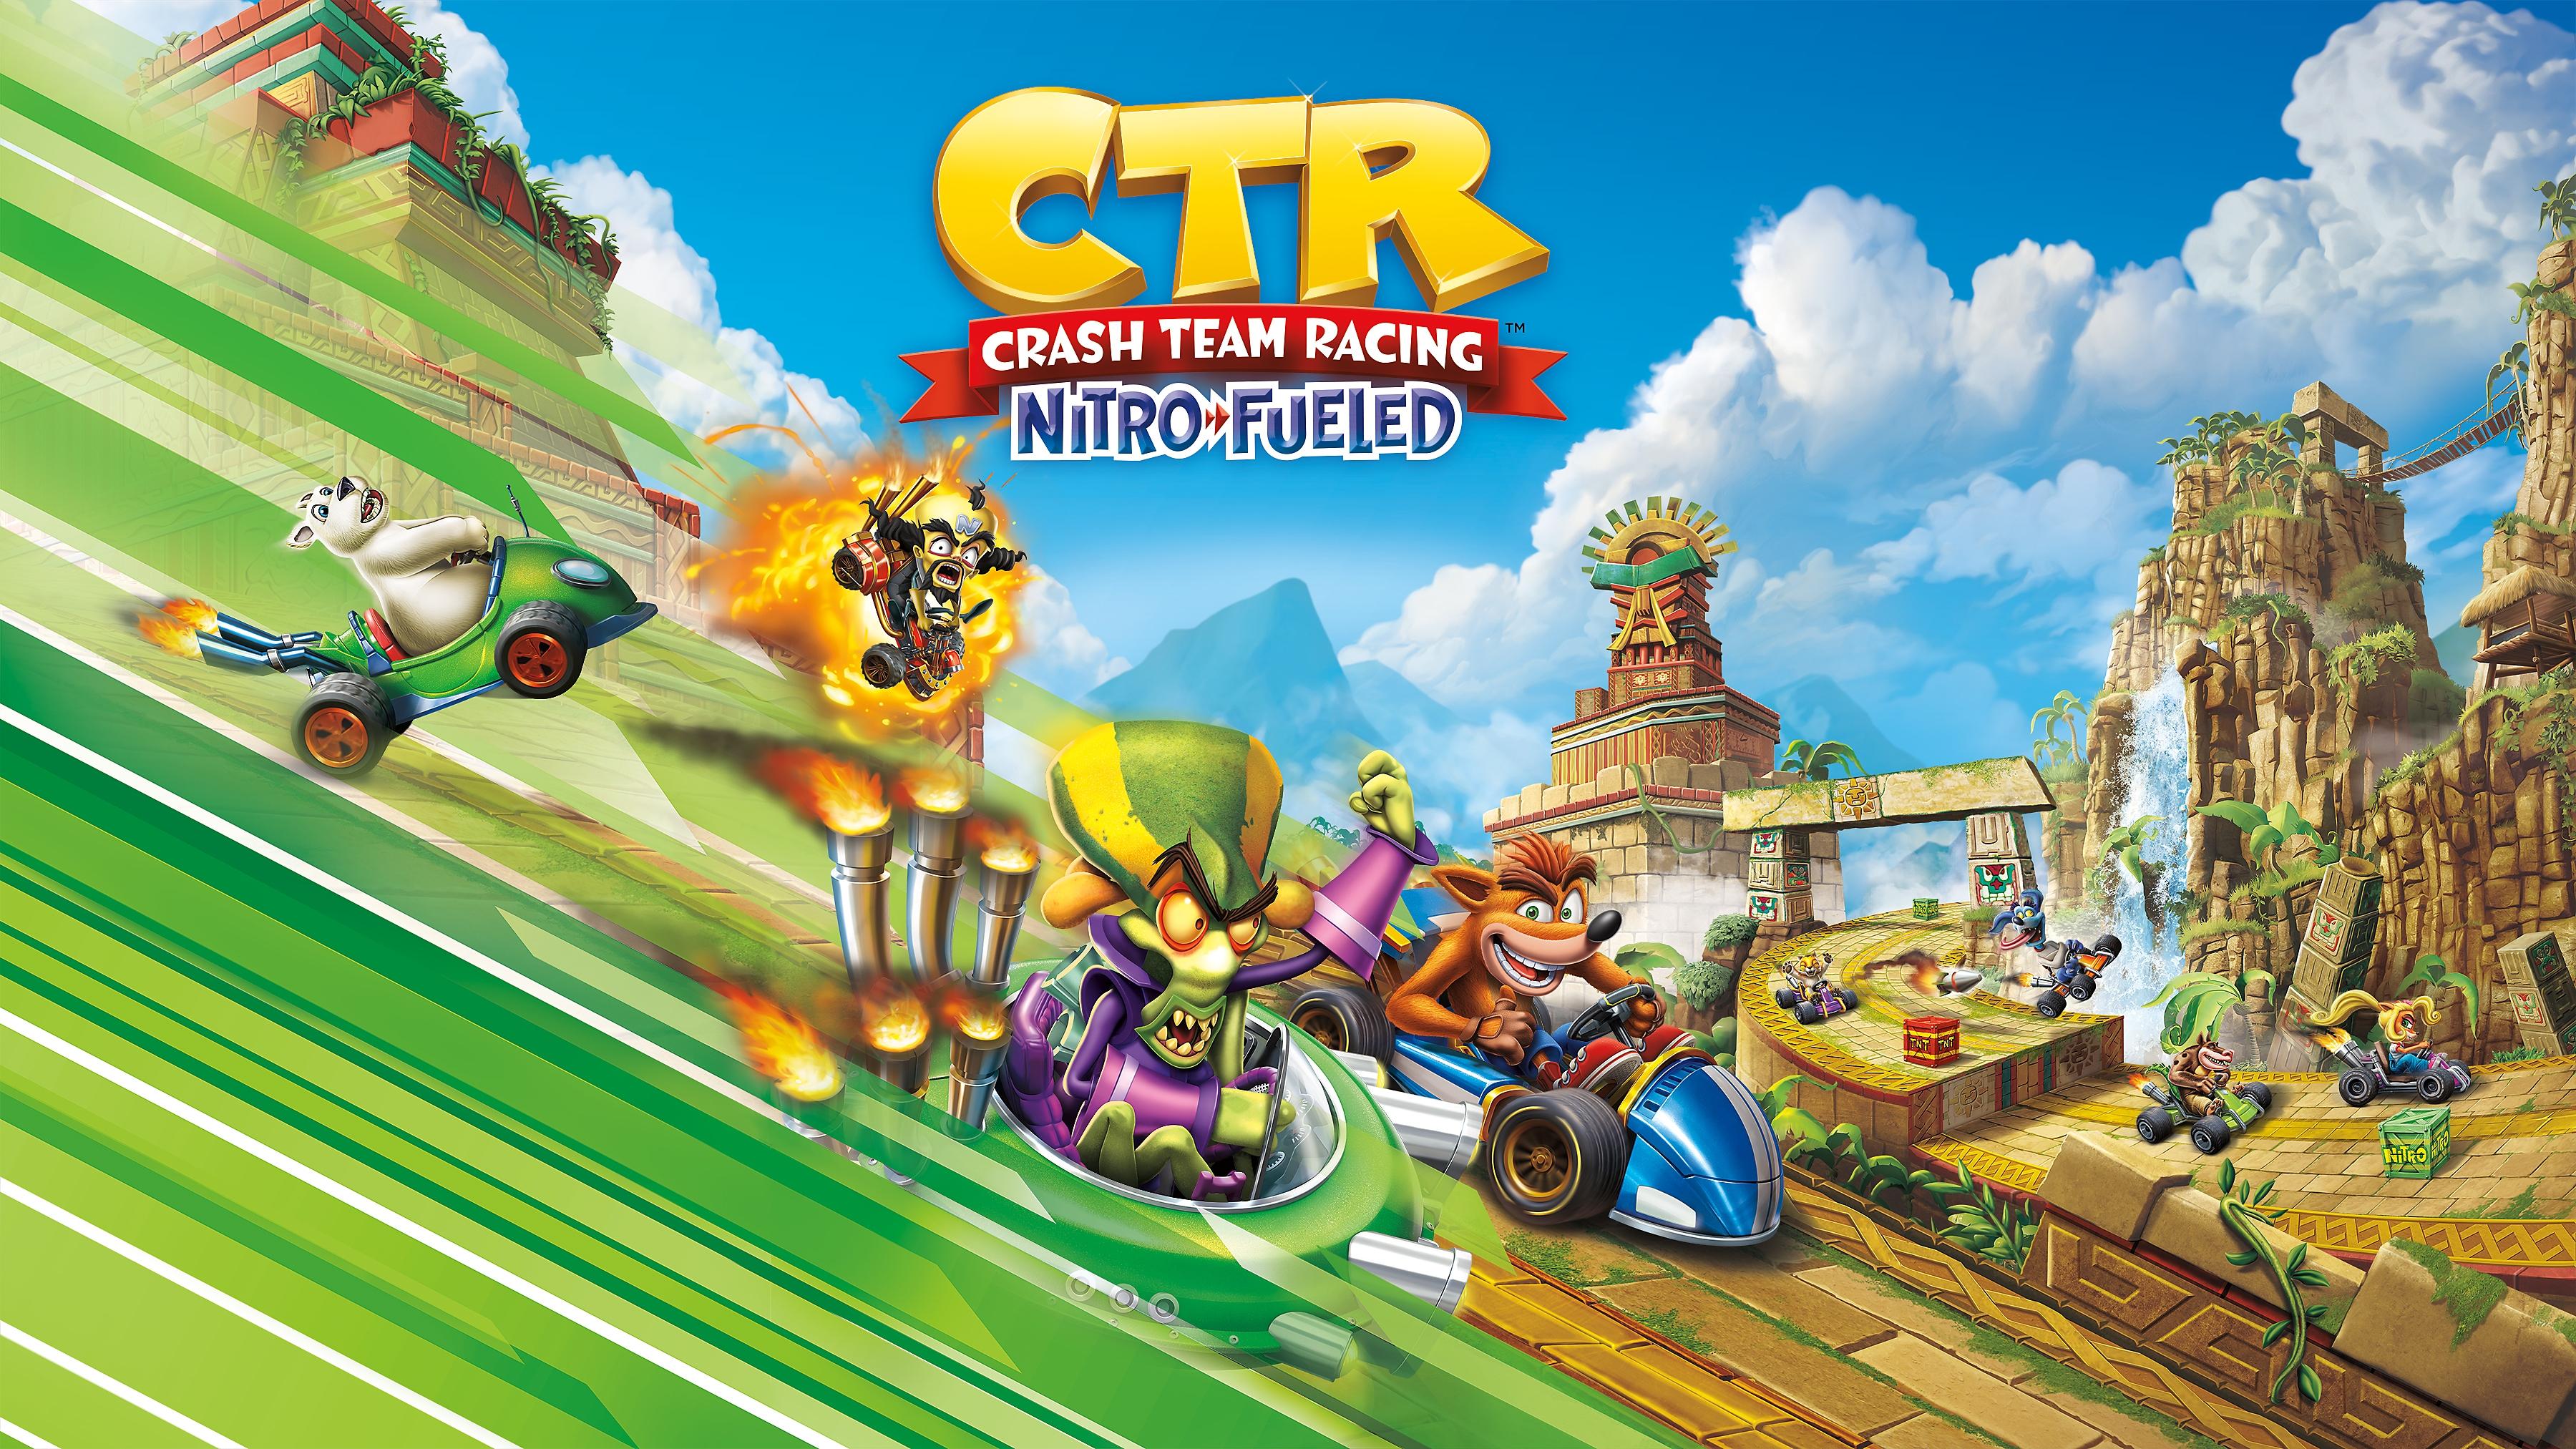 Crash Team Racing Nitro Fueled – Nitros Oxide Edition – packshot